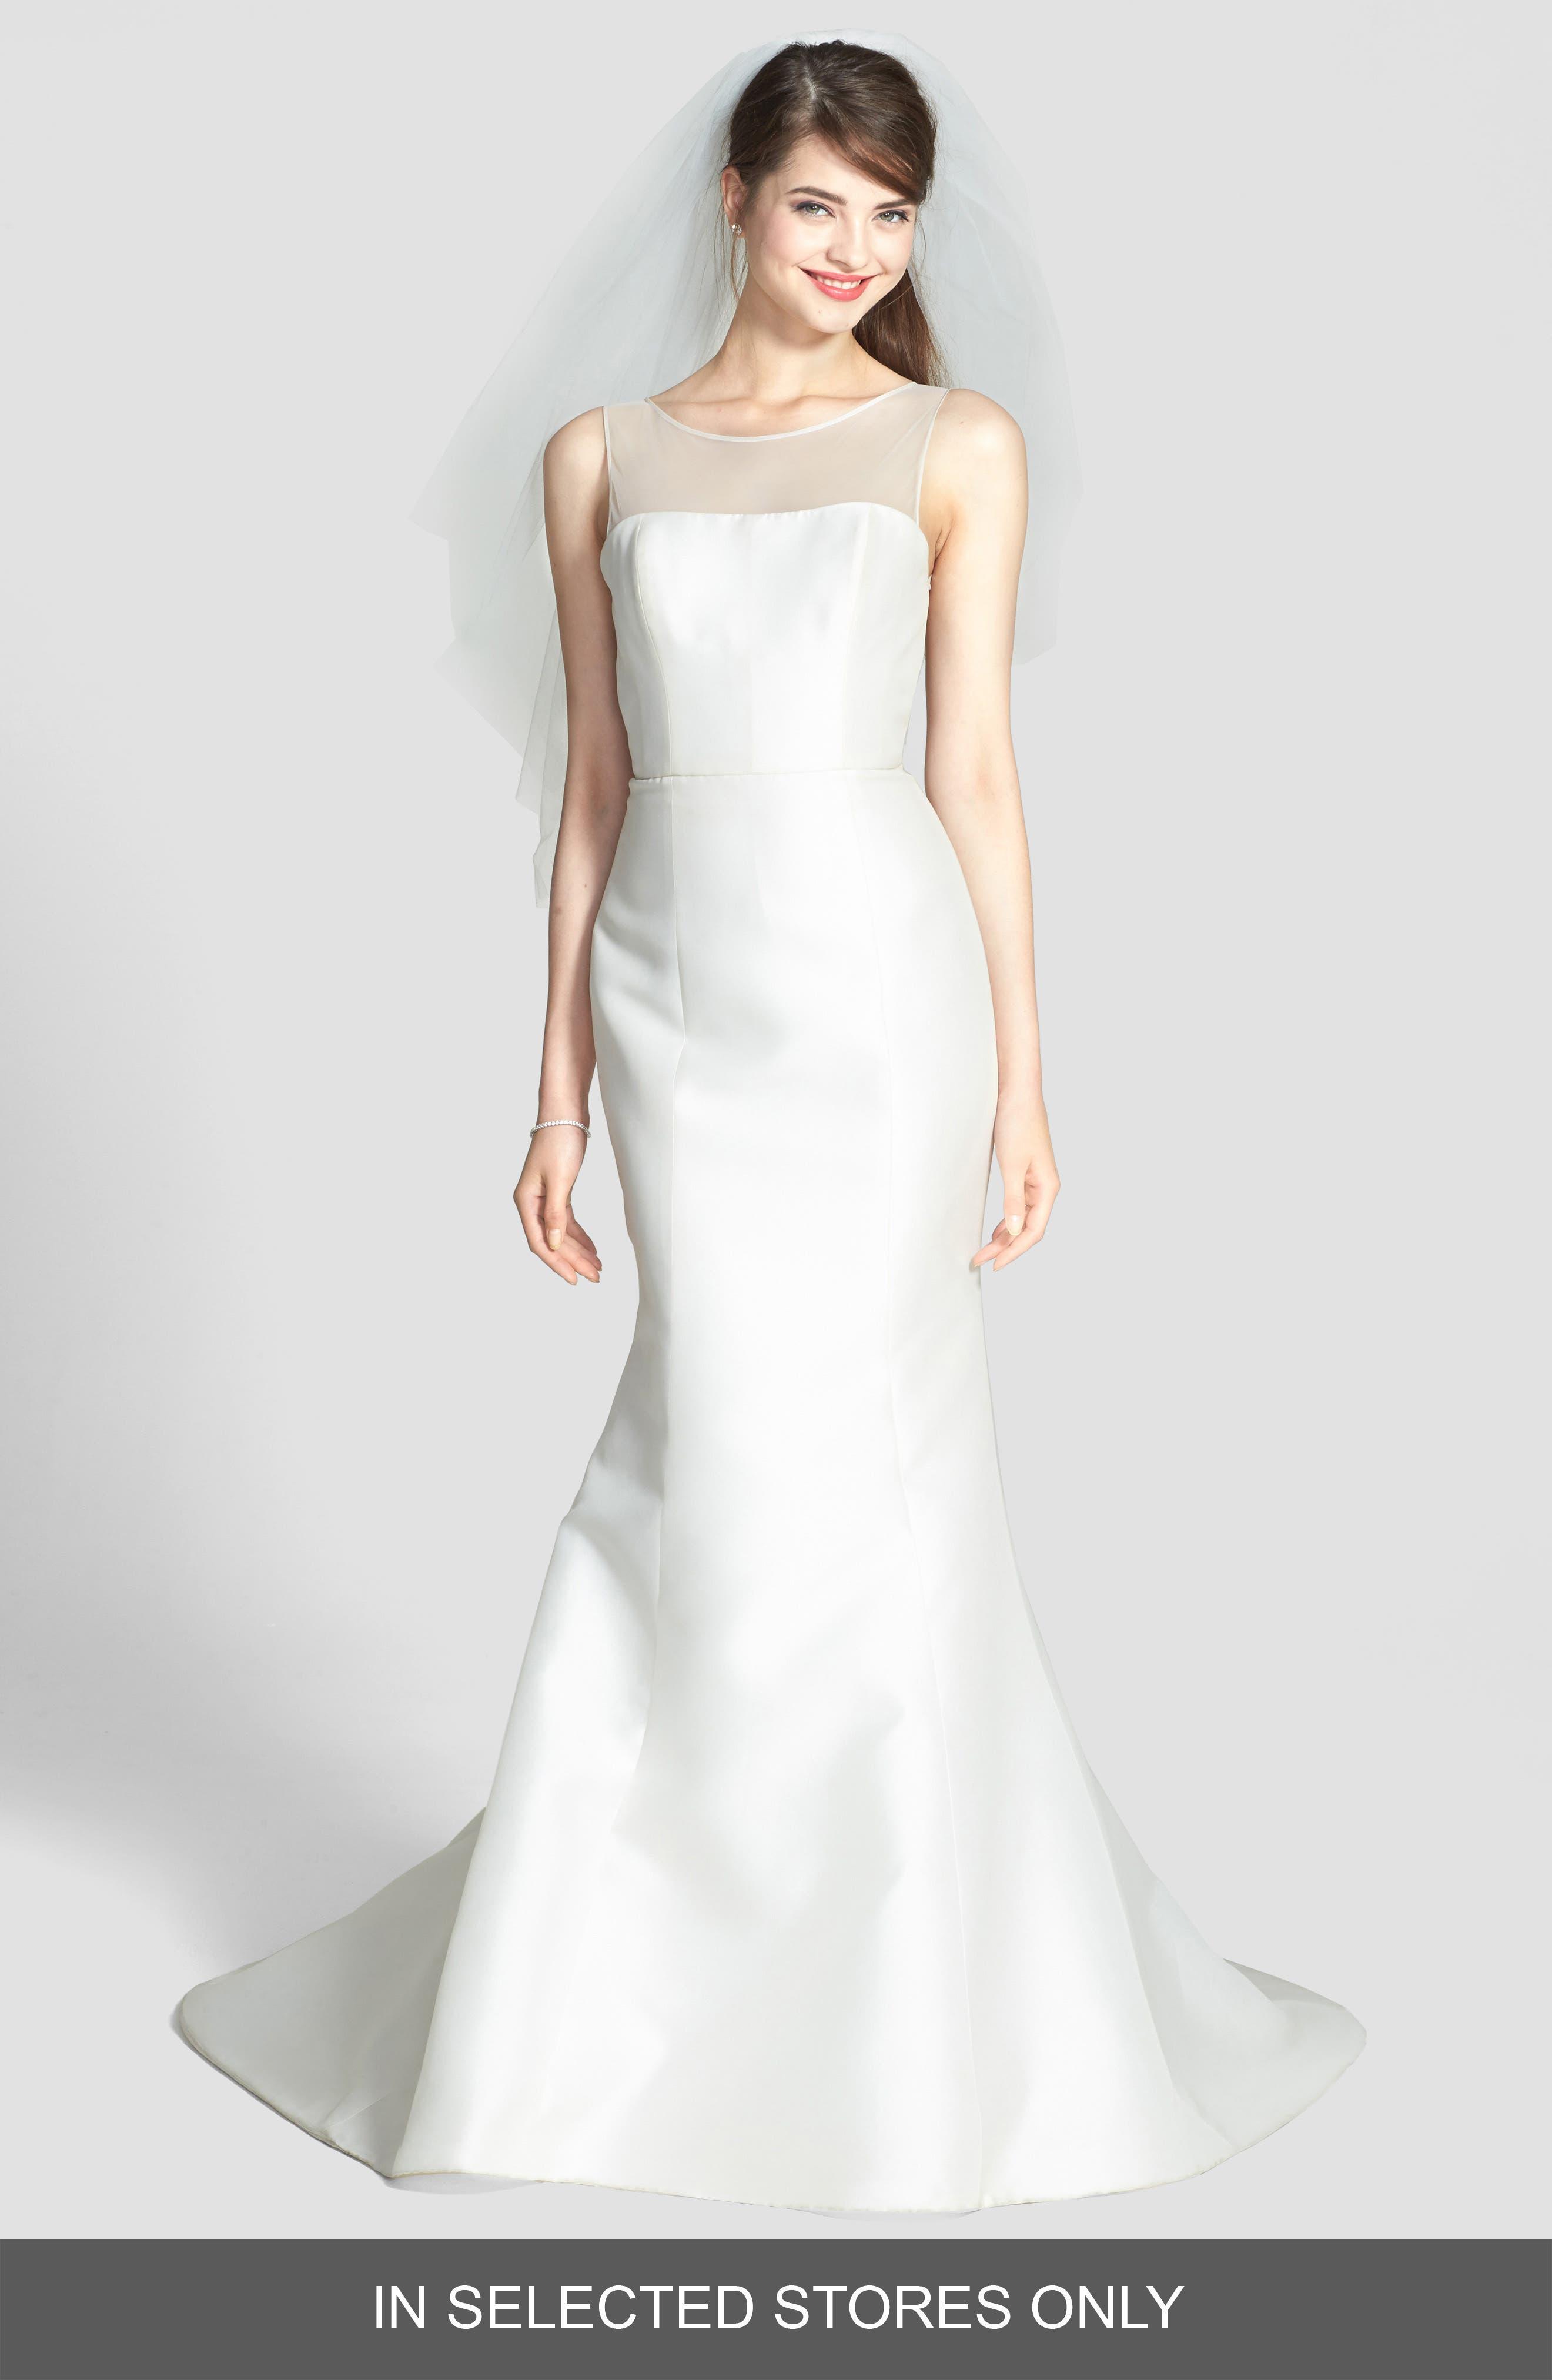 Alternate Image 1 Selected - Amsale Preston Silk Magnolia Sheath Wedding Dress